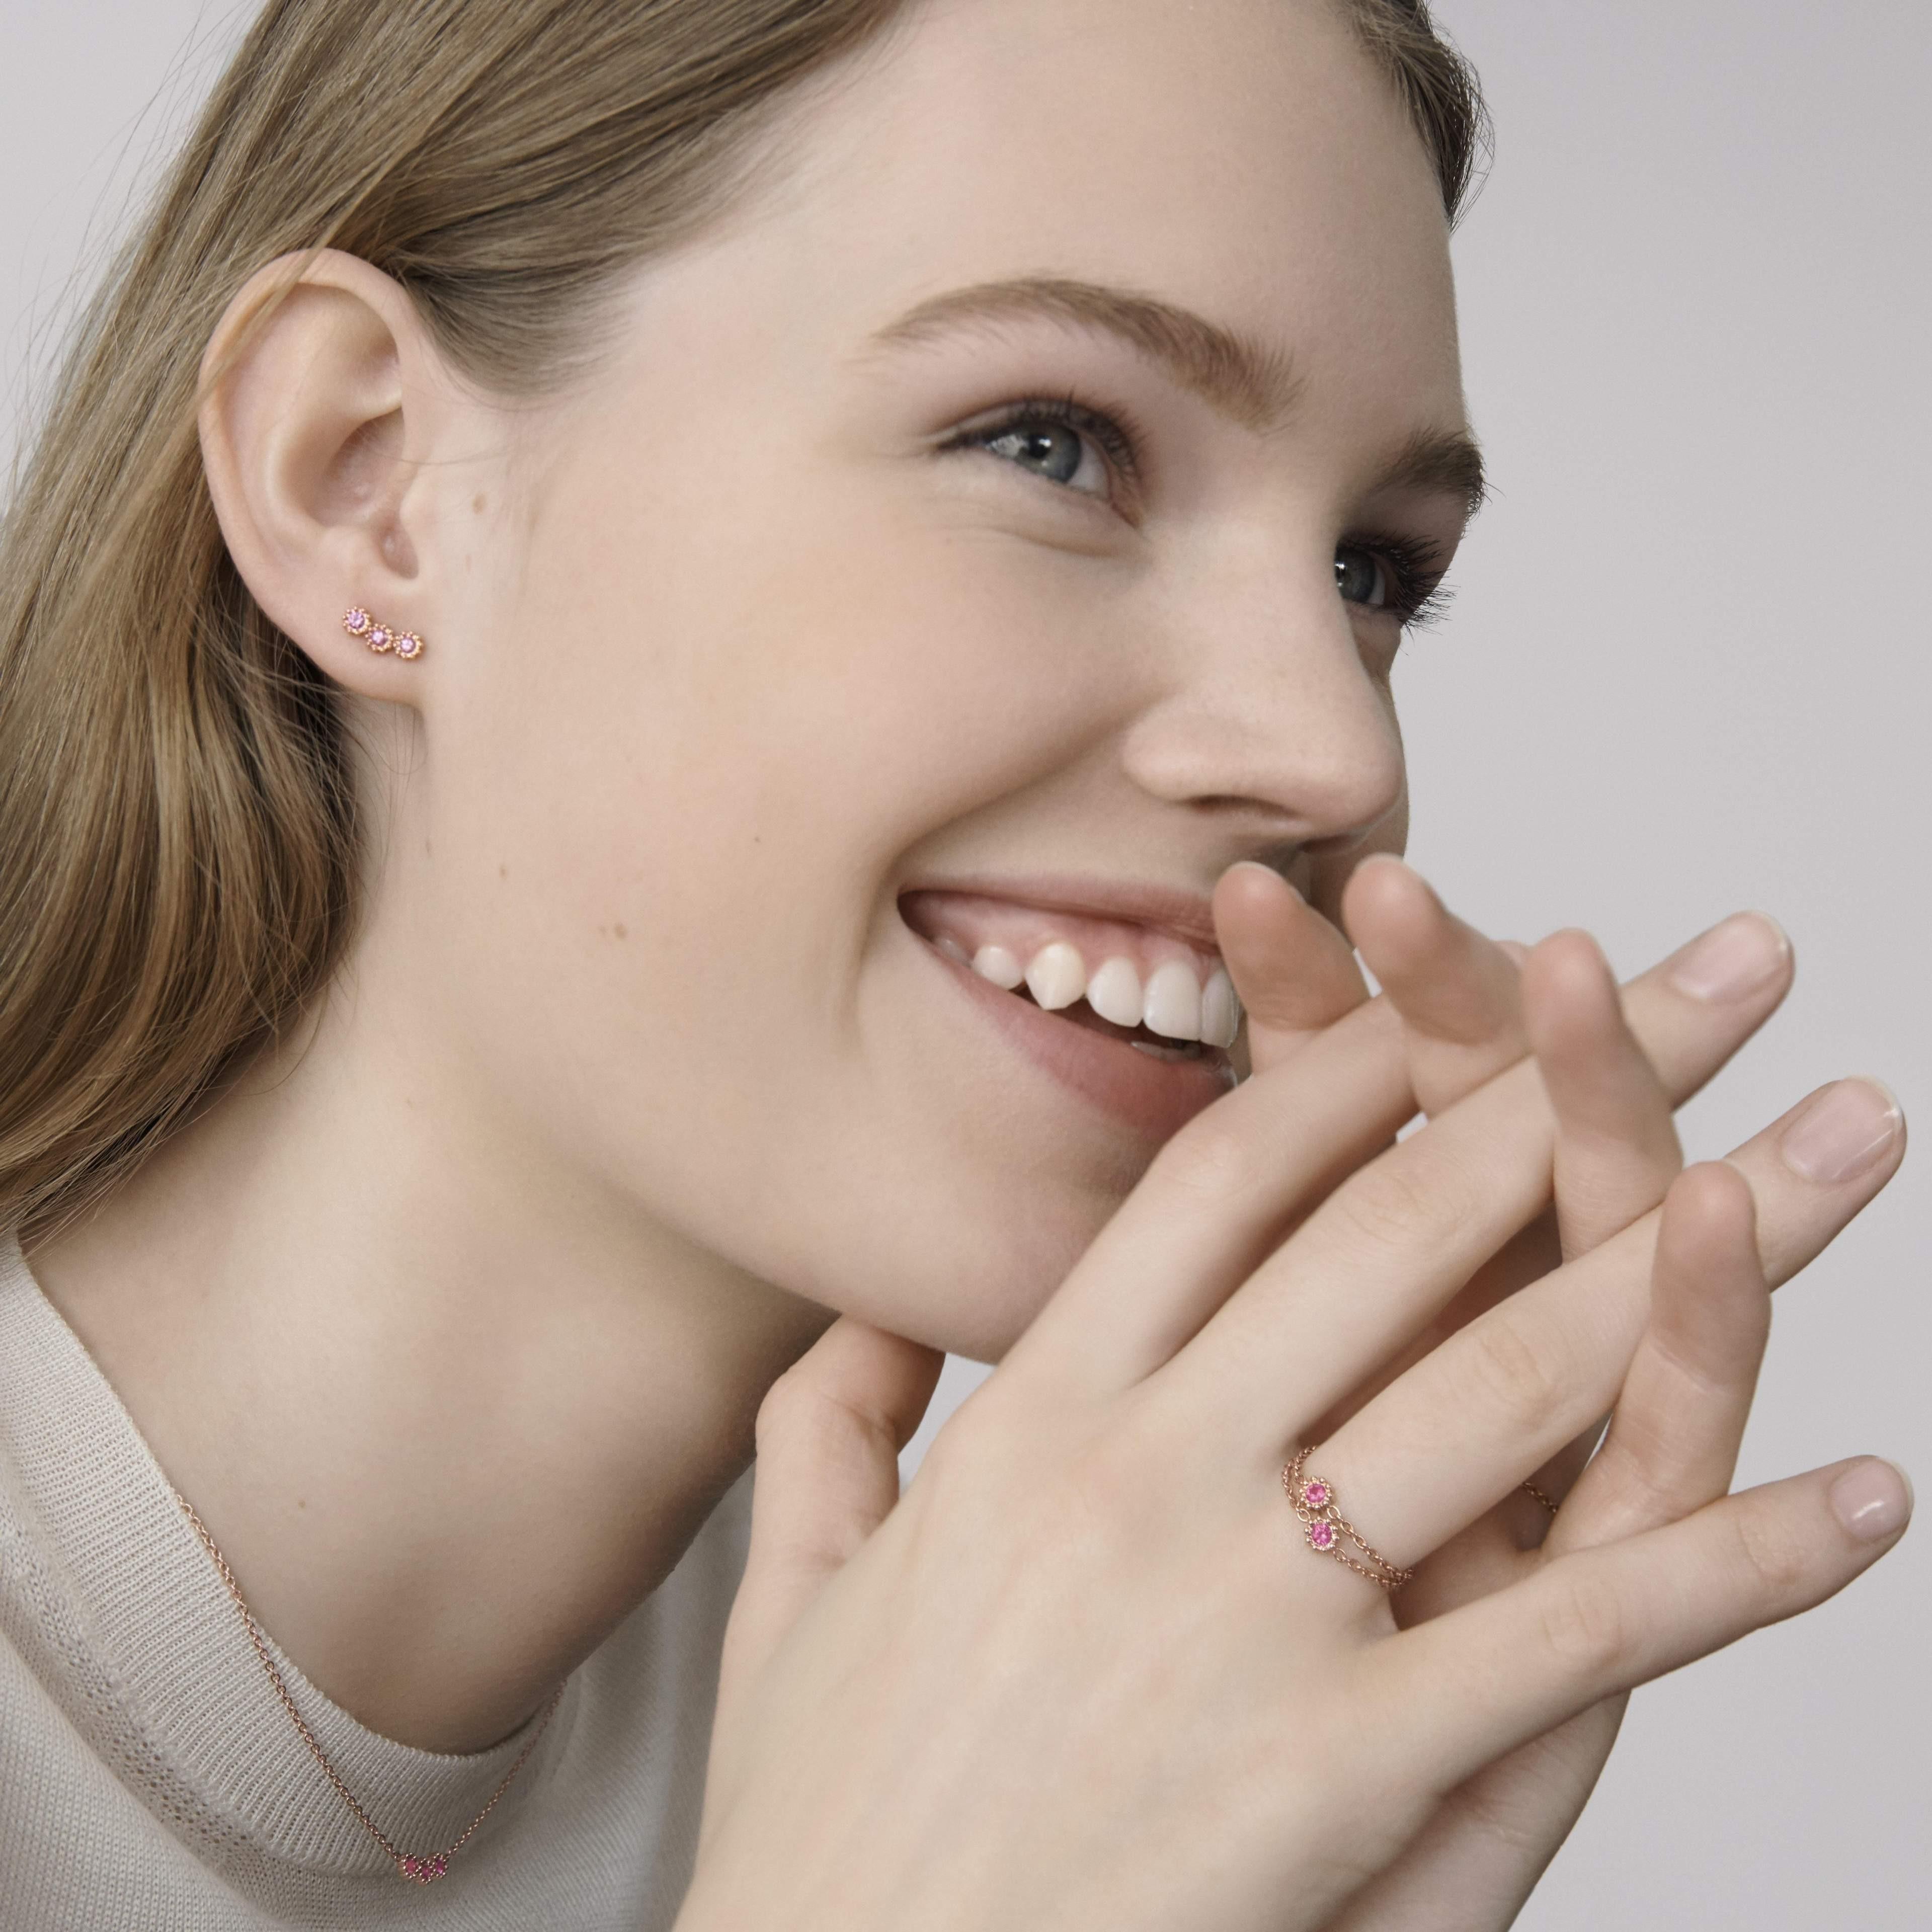 Dior推3万元有找的钻戒 当贴身幸运物刚刚好